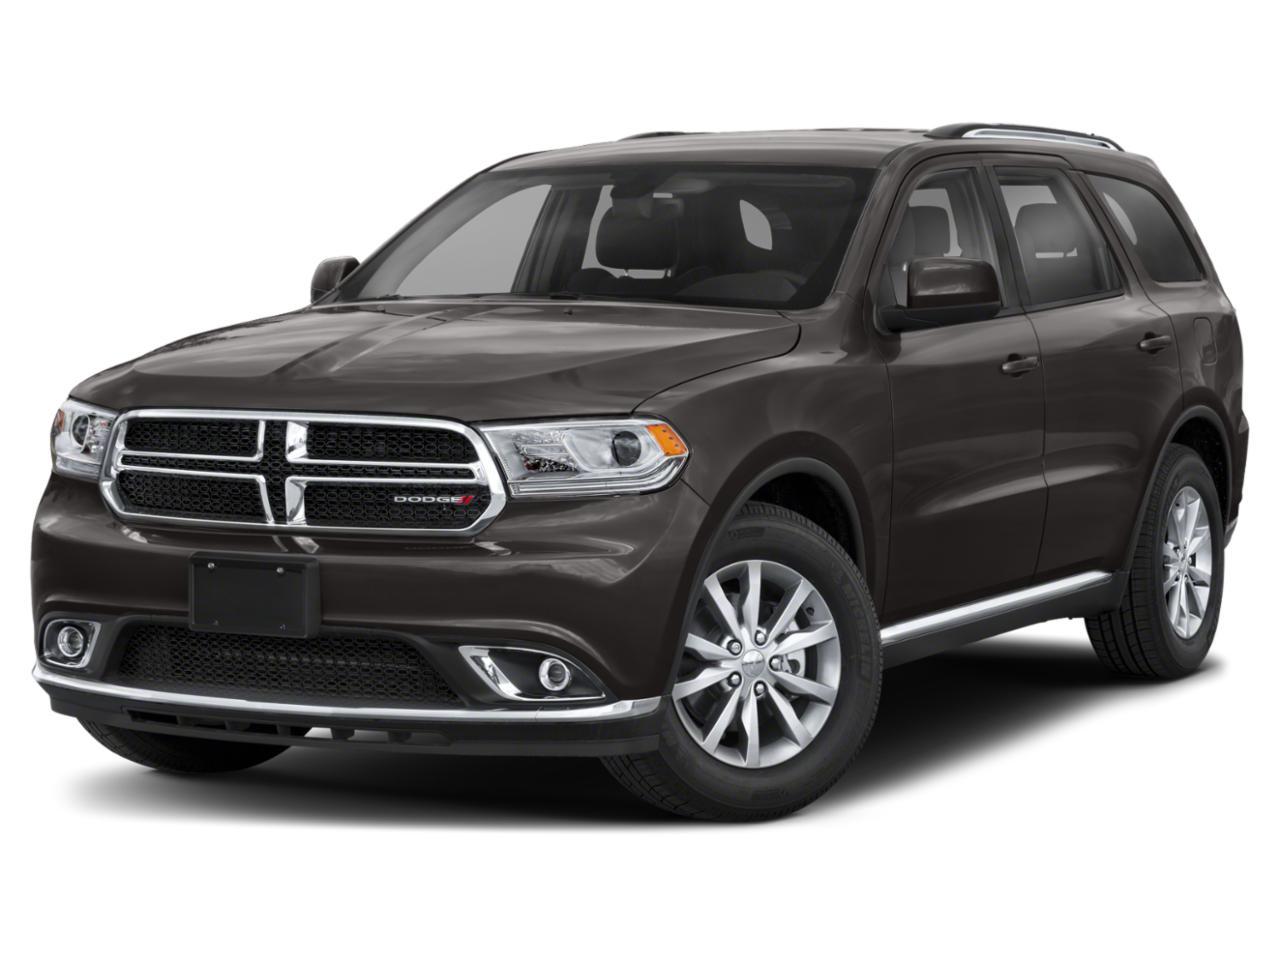 2018 Dodge Durango Vehicle Photo in SAN ANTONIO, TX 78254-9999